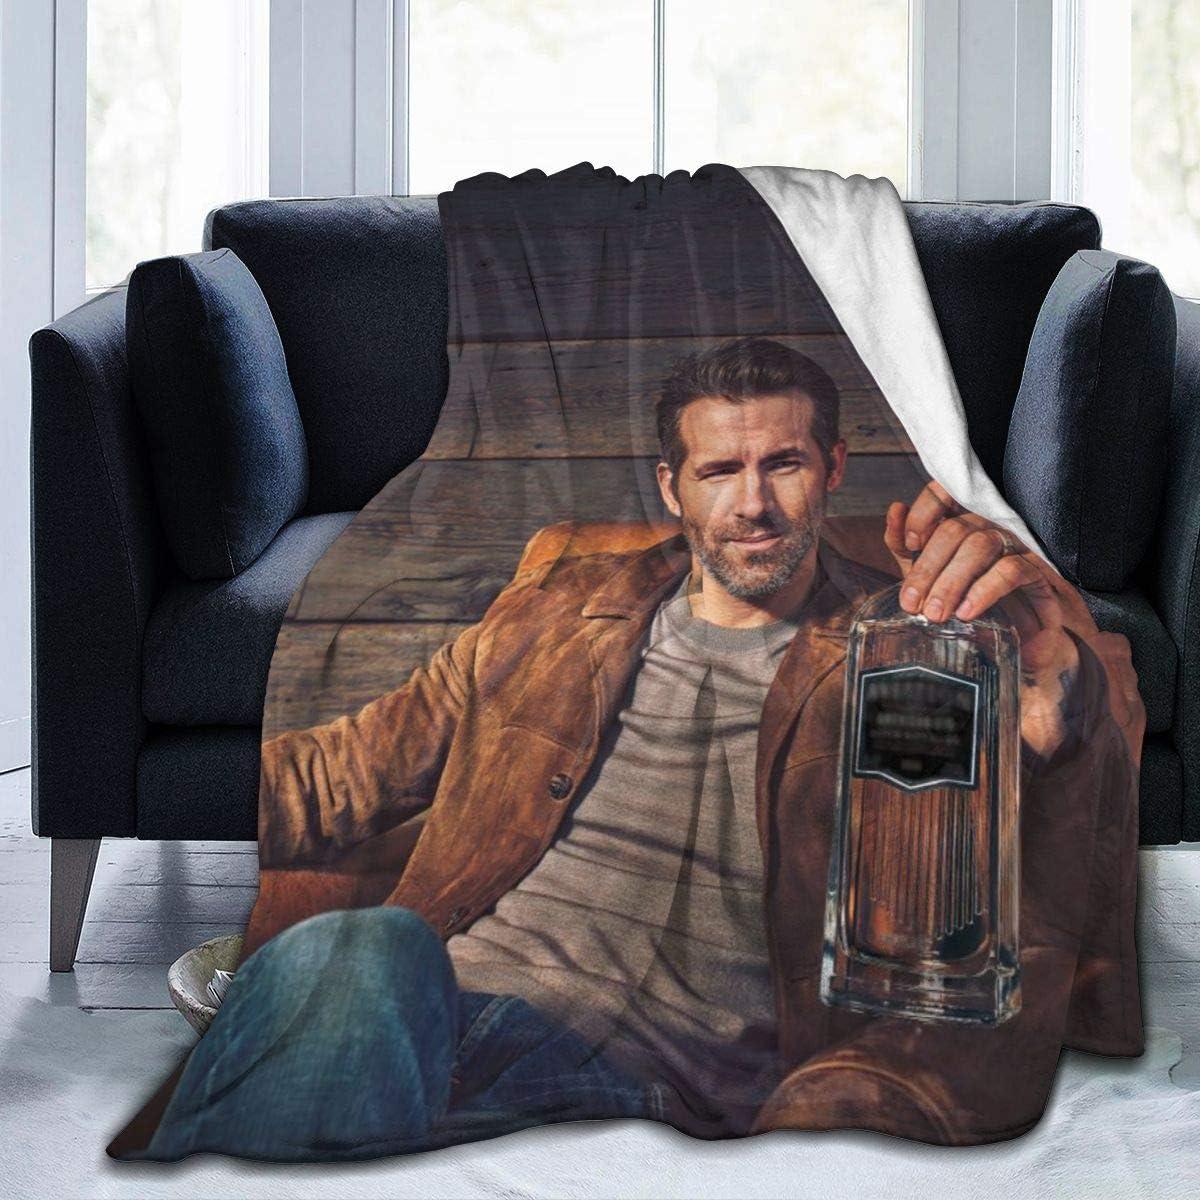 BIGFANSS Ultra-Soft Micro Fleece Blanket